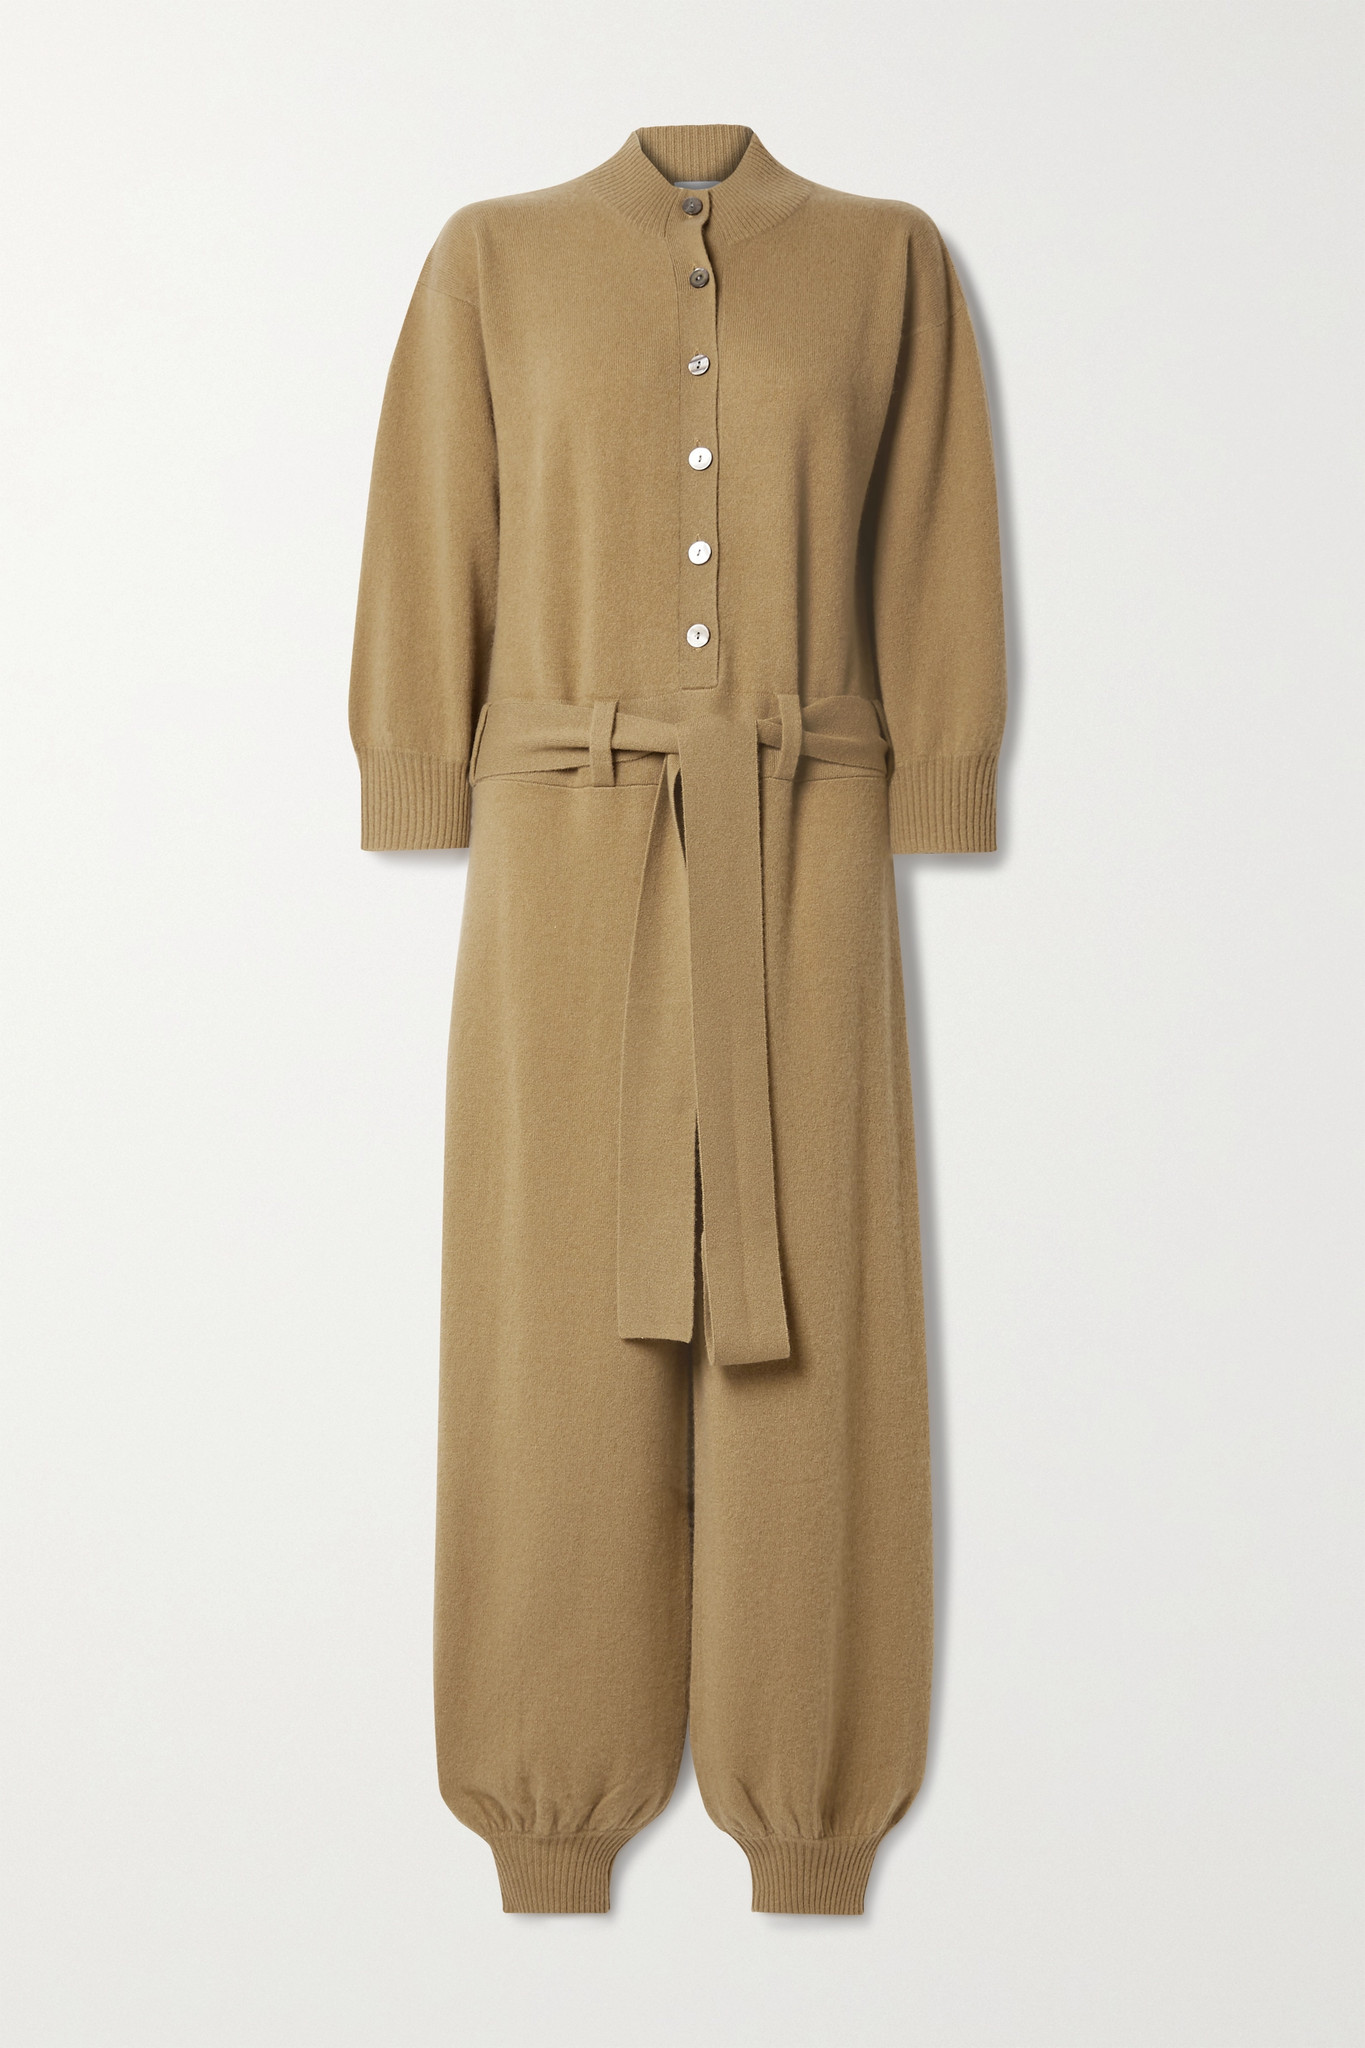 MADELEINE THOMPSON - Thurman 配腰带羊绒连身裤 - 棕色 - large